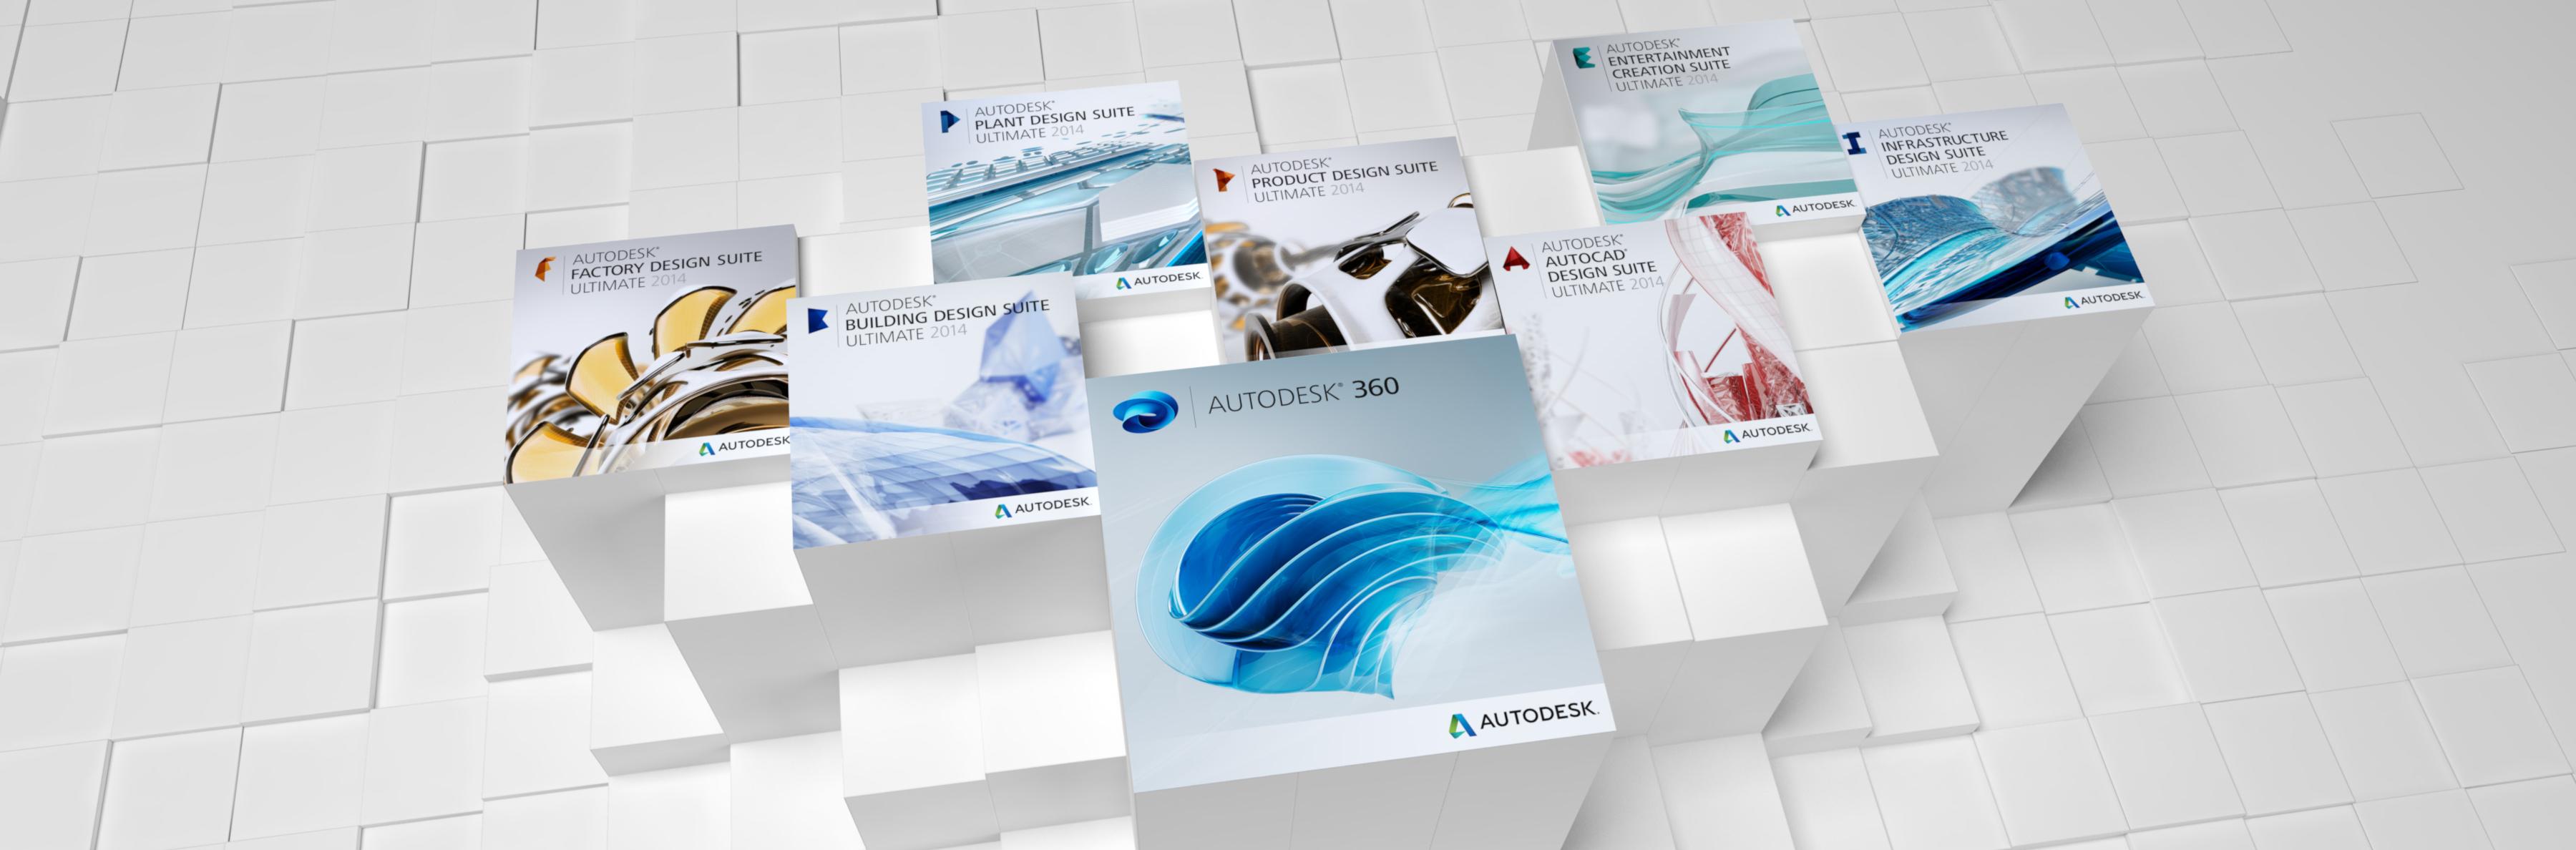 Autodesk Design and Creation Suites